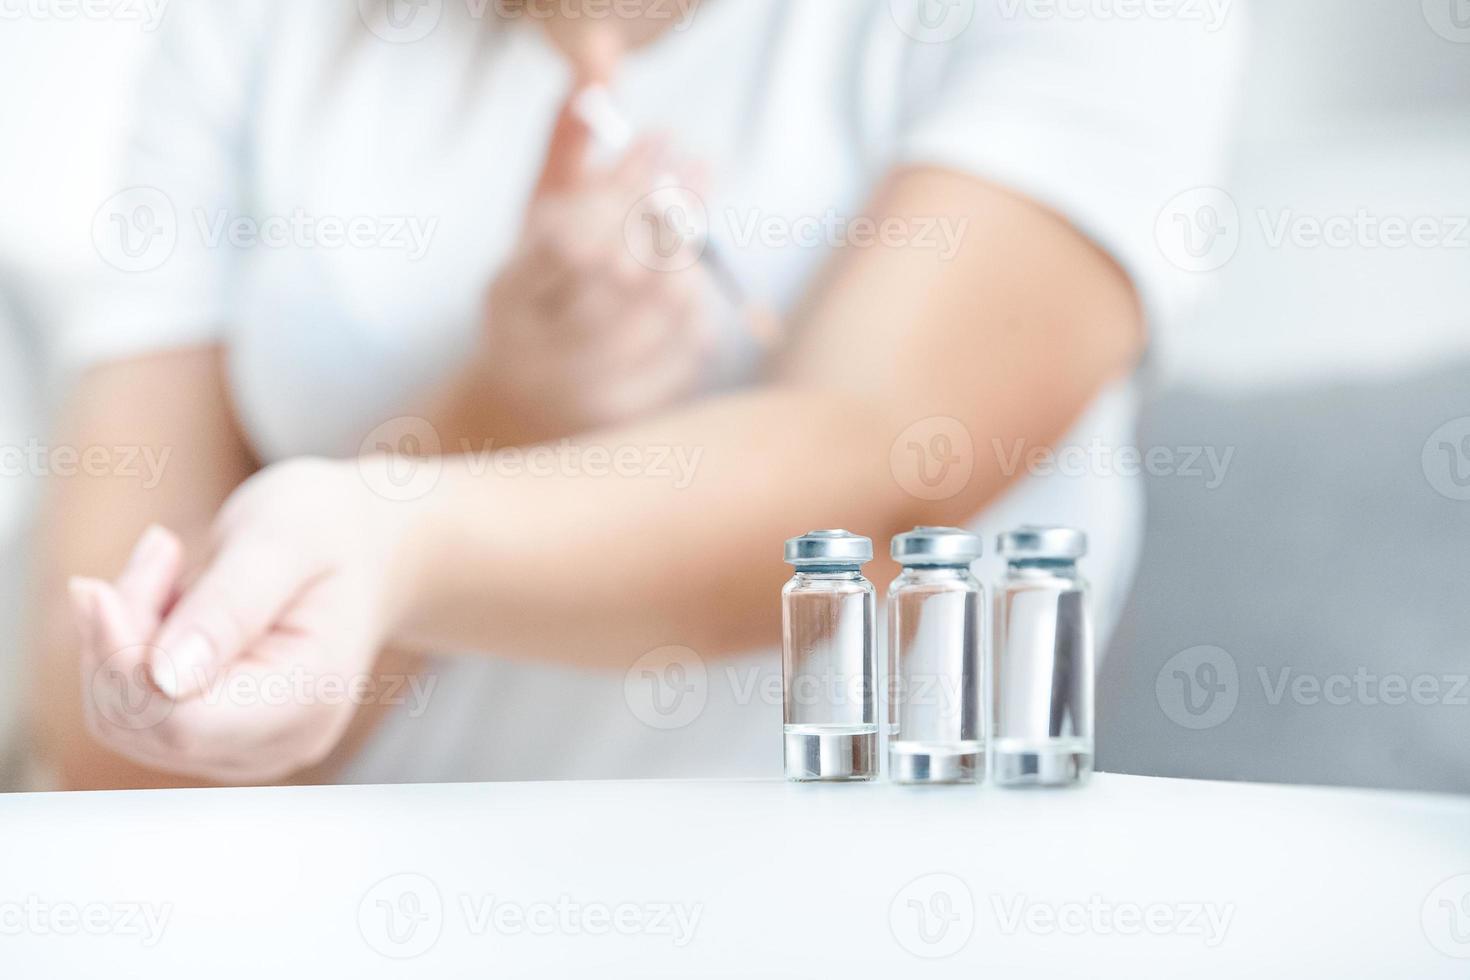 frascos de vidrio con insulina contra mujer haciendo pinchazo foto